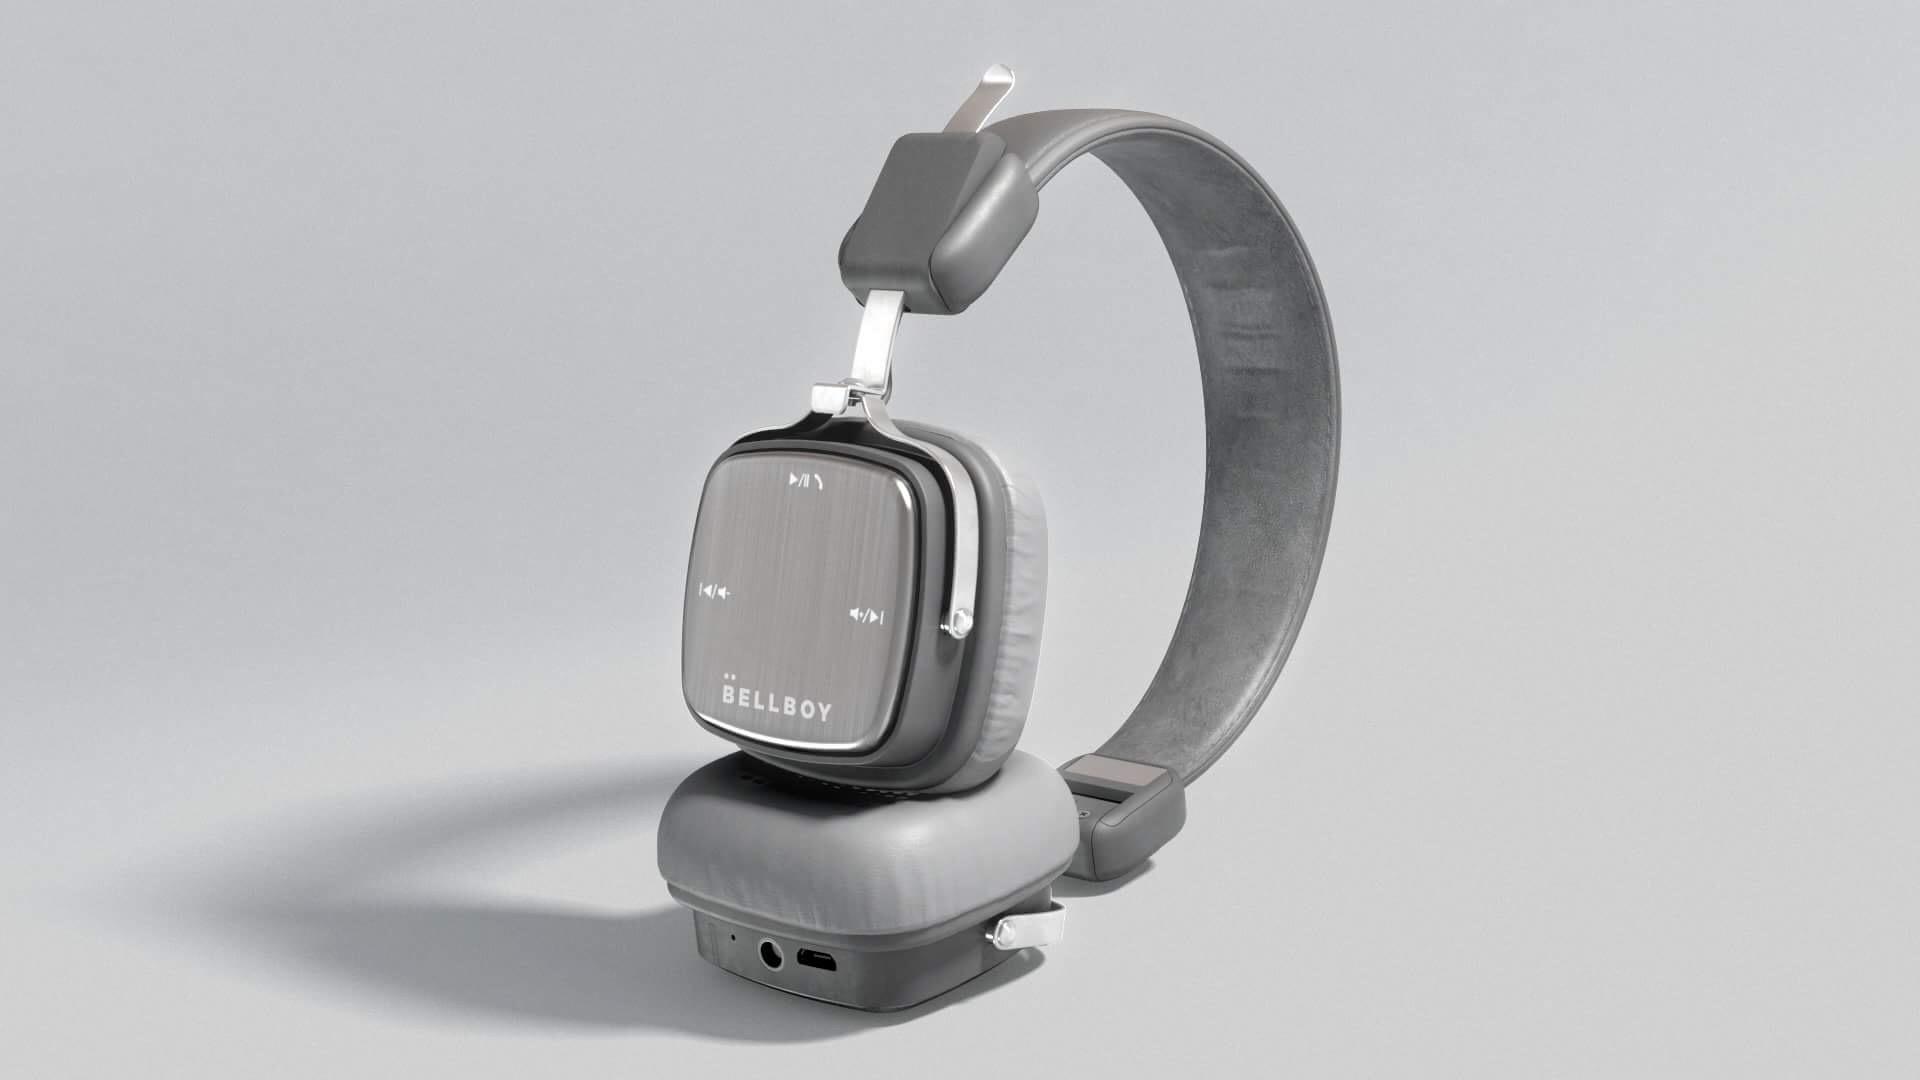 bellboy bluetooth headphones review 14. Black Bedroom Furniture Sets. Home Design Ideas